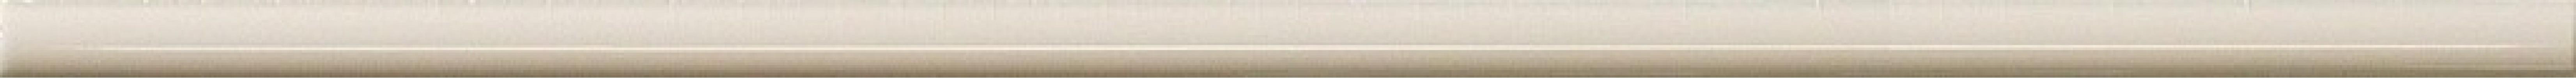 Бордюр Antica Ceramica Rubiera Alterego List. Tortora 1x40 201424